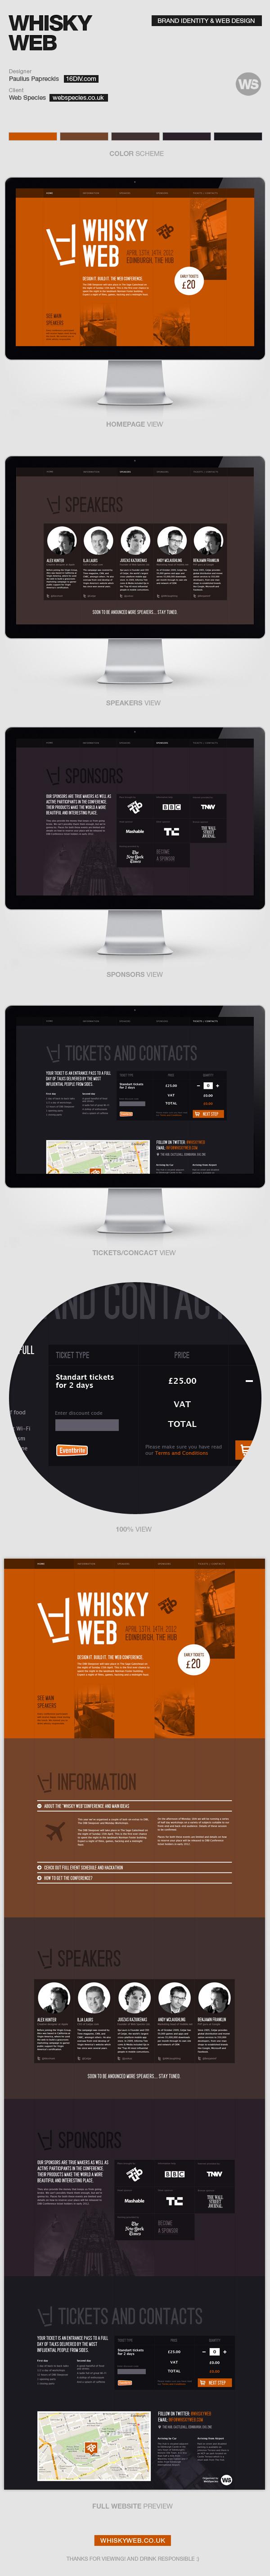 Whisky Web Conference In Edinburgh On Web Design Served Web Development Design Interactive Design News Web Design